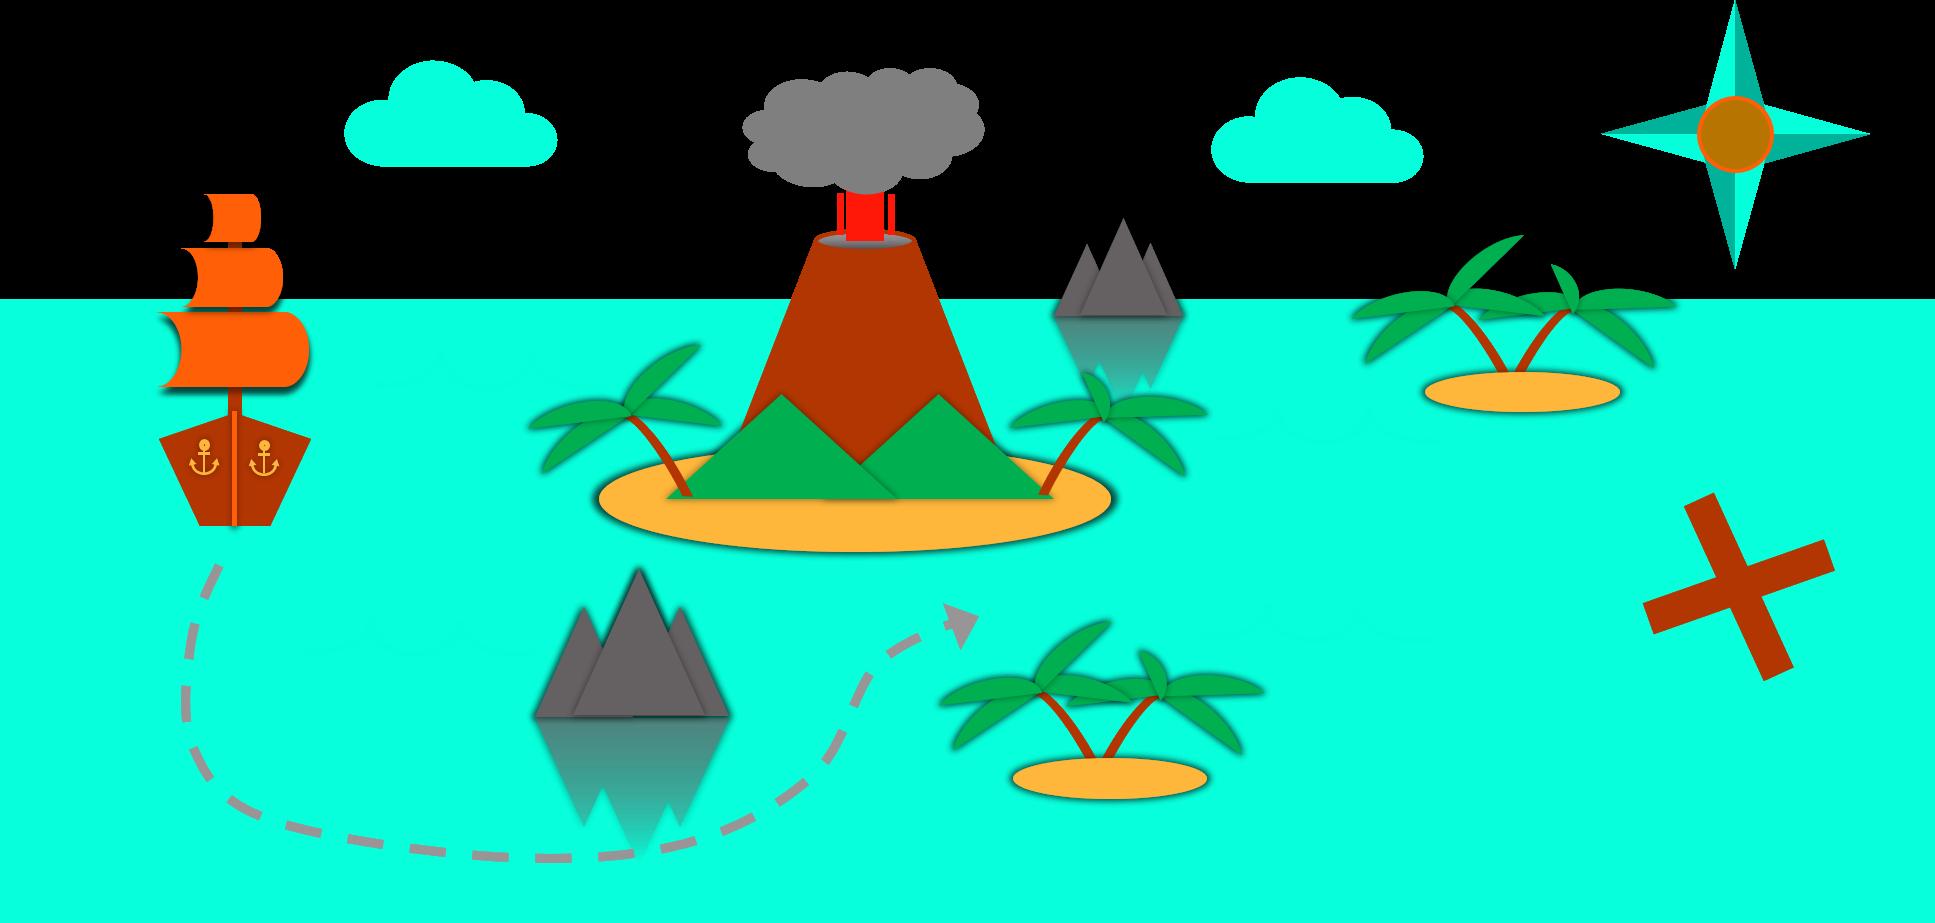 Process Mining Discovery Pirate's Path